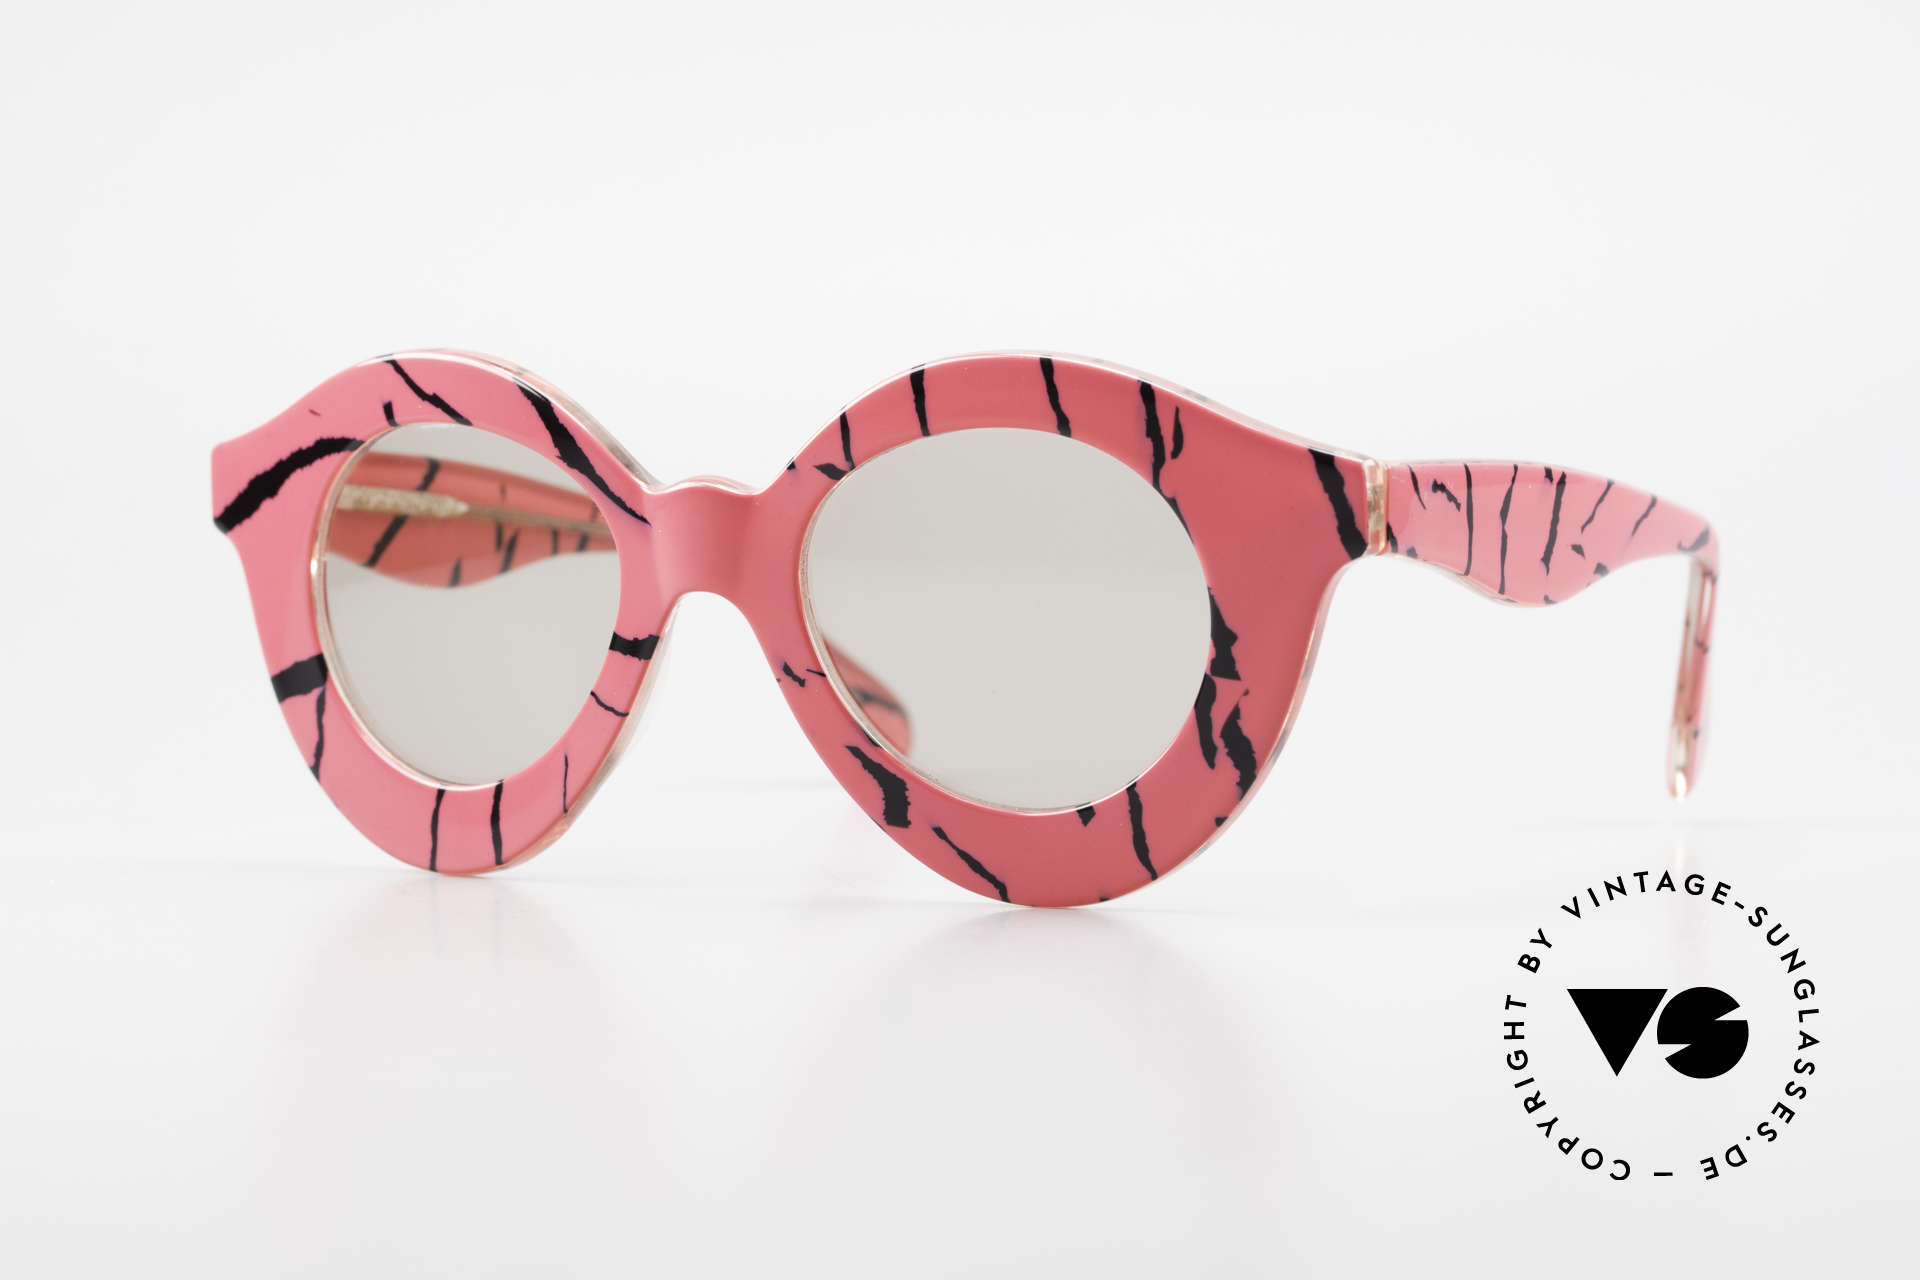 Michèle Lamy - Rita True Connoisseur Sunglasses, true vintage connoisseur / insider sunglasses, Made for Women